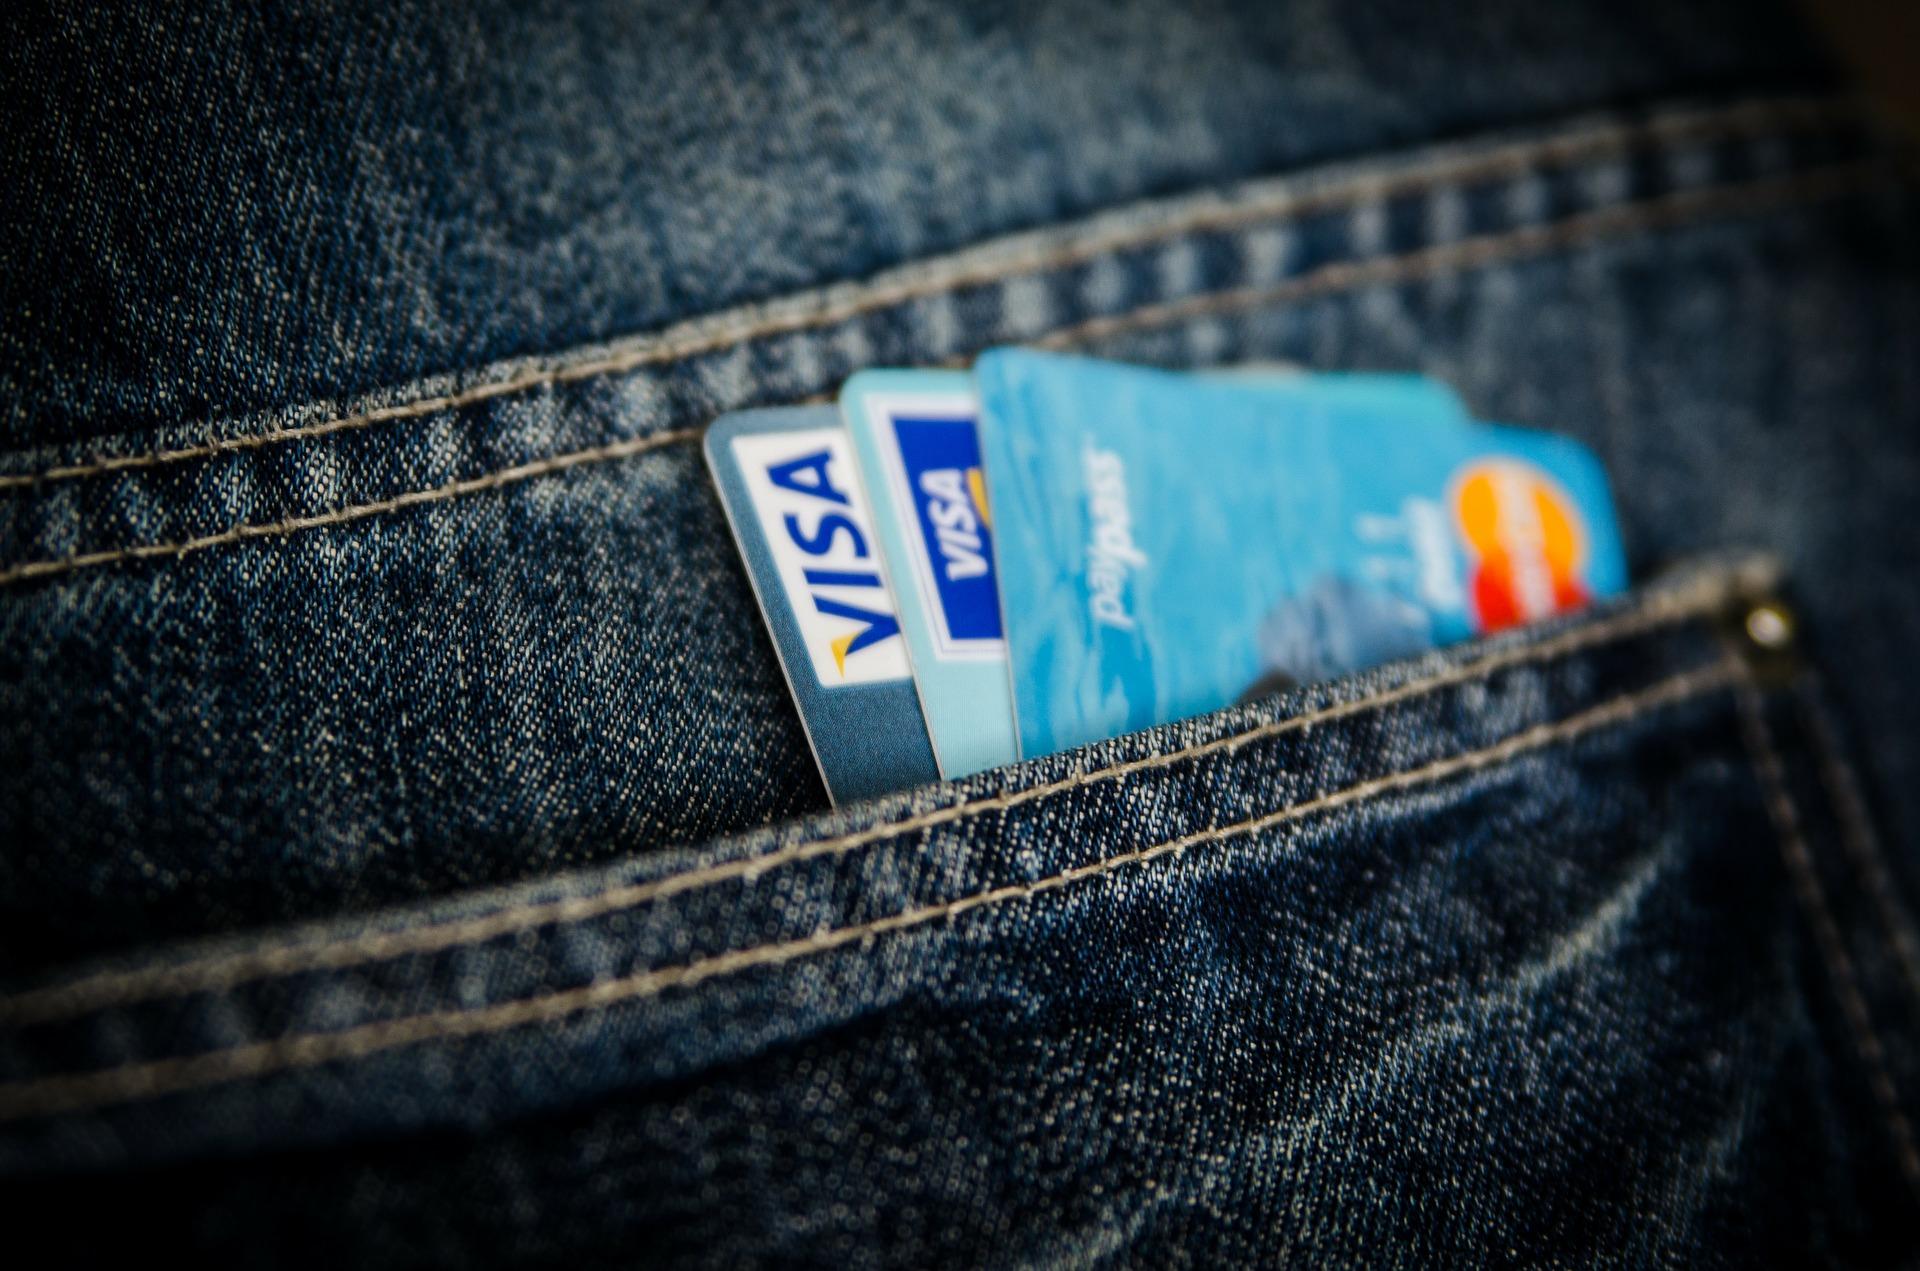 Visa emite un informe NFT después de comprar CryptoPunk, cita Ethereum & Flow Blockchain